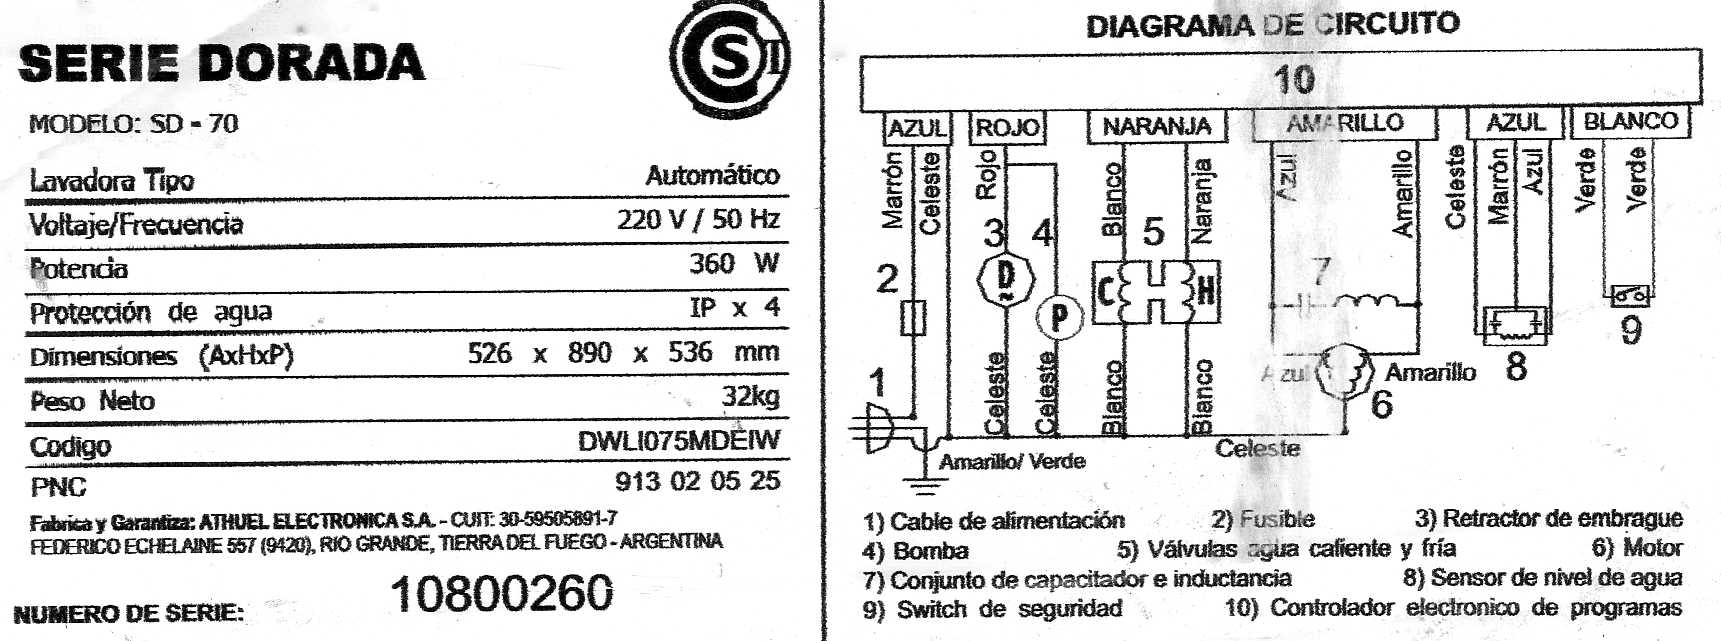 instalacion manuelle dsc 585 classic